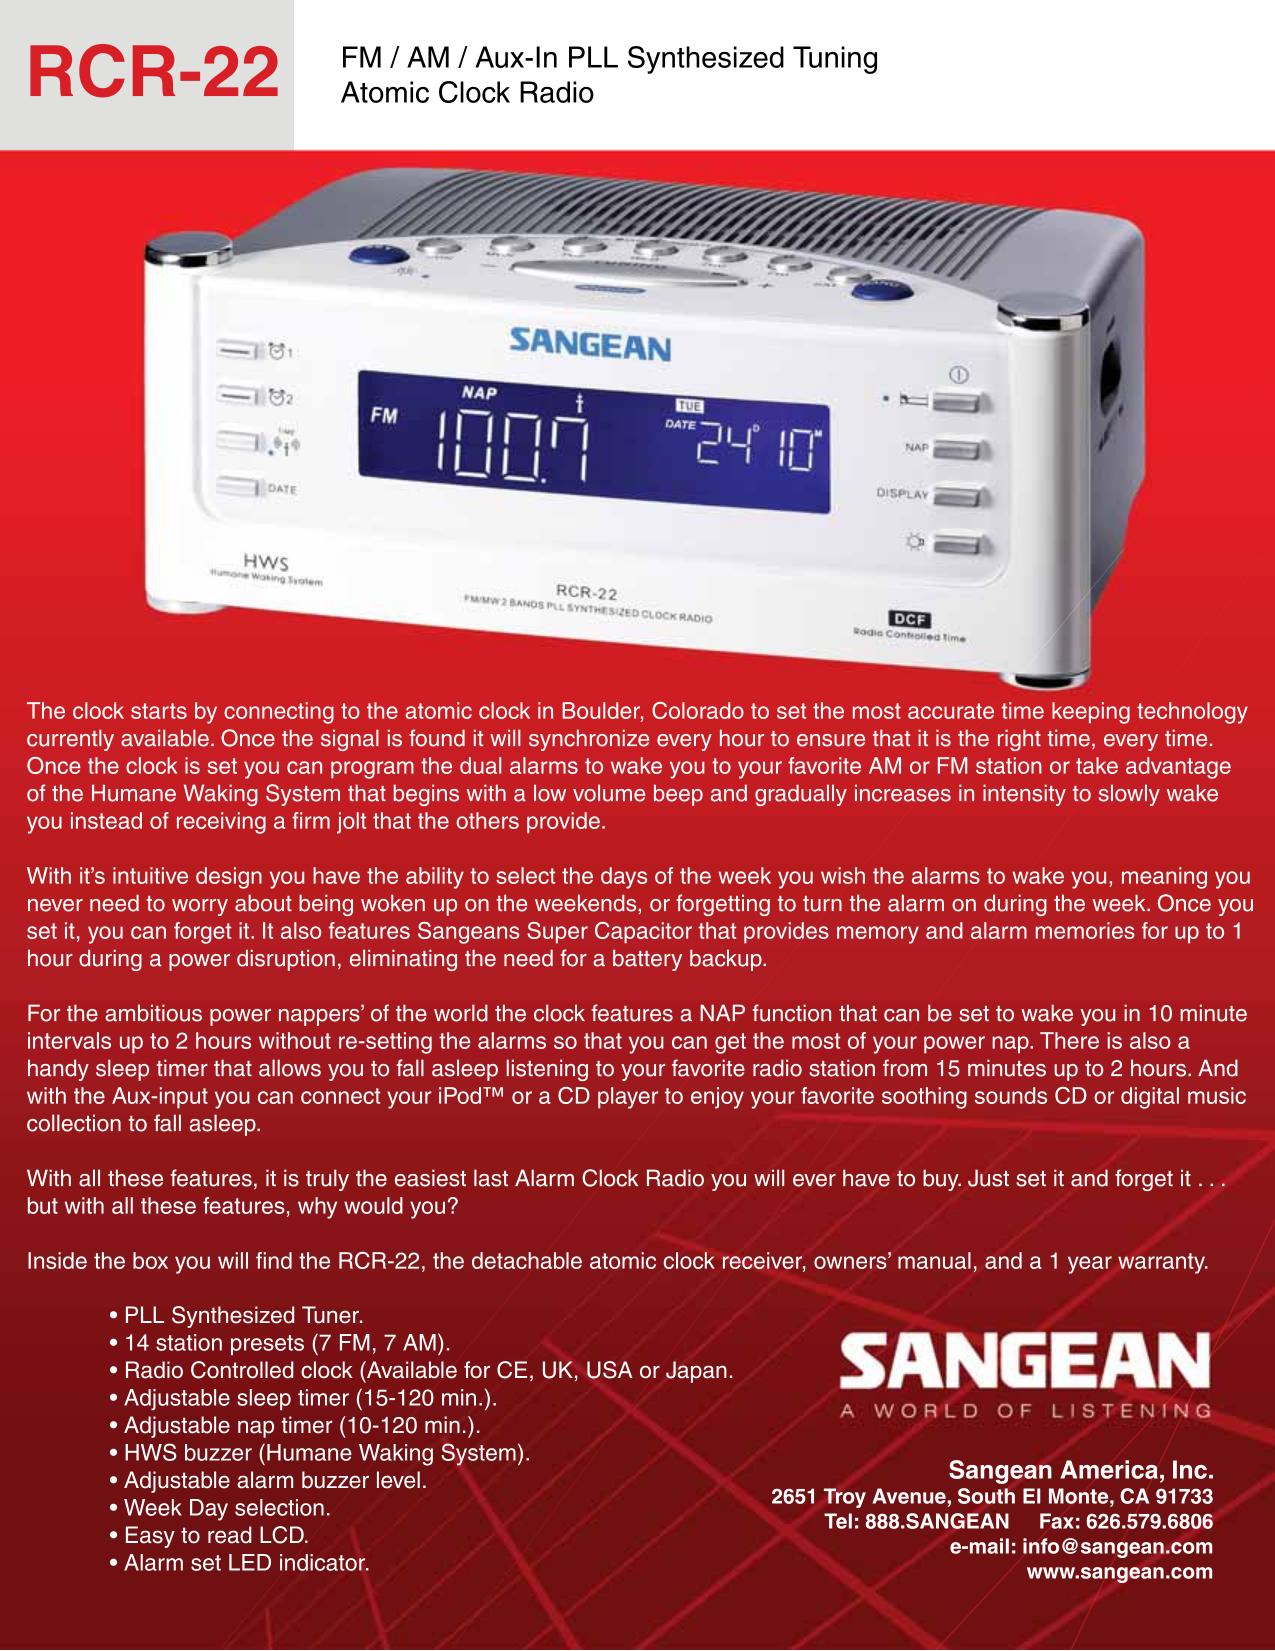 sangean rcr 22 manual user guide manual that easy to read u2022 rh sibere co